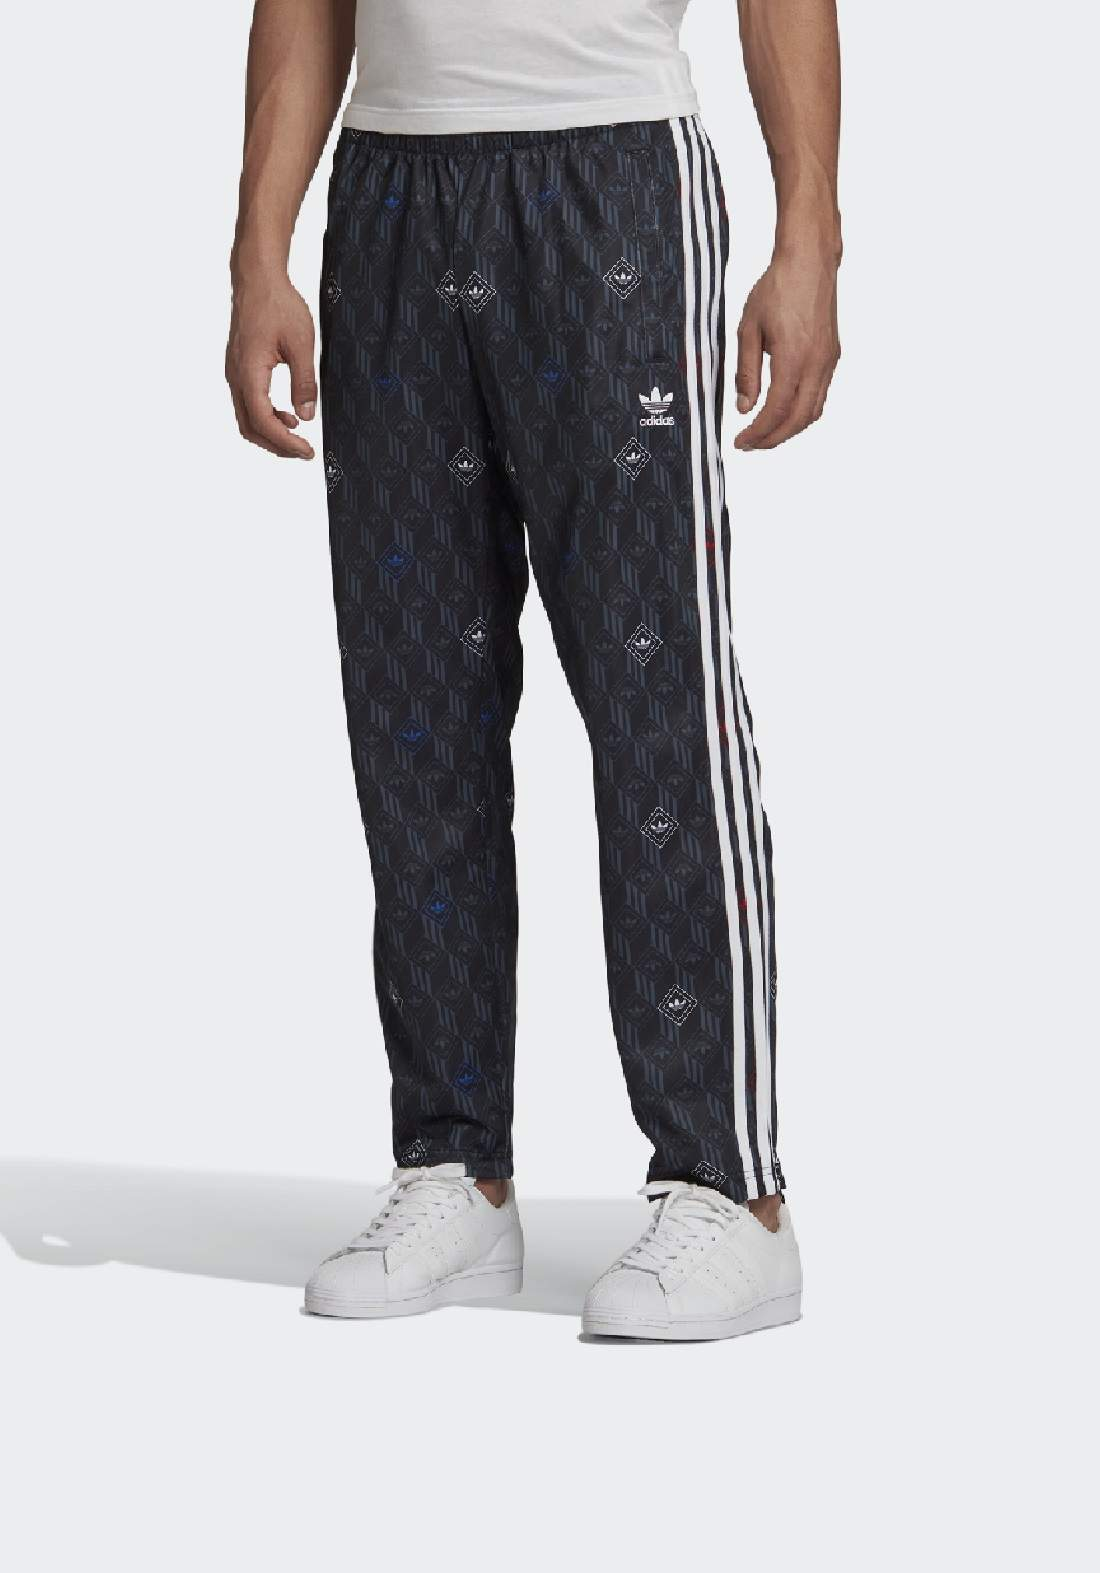 Adidas بنطلون رياضي رجالي متعدد الالوان من